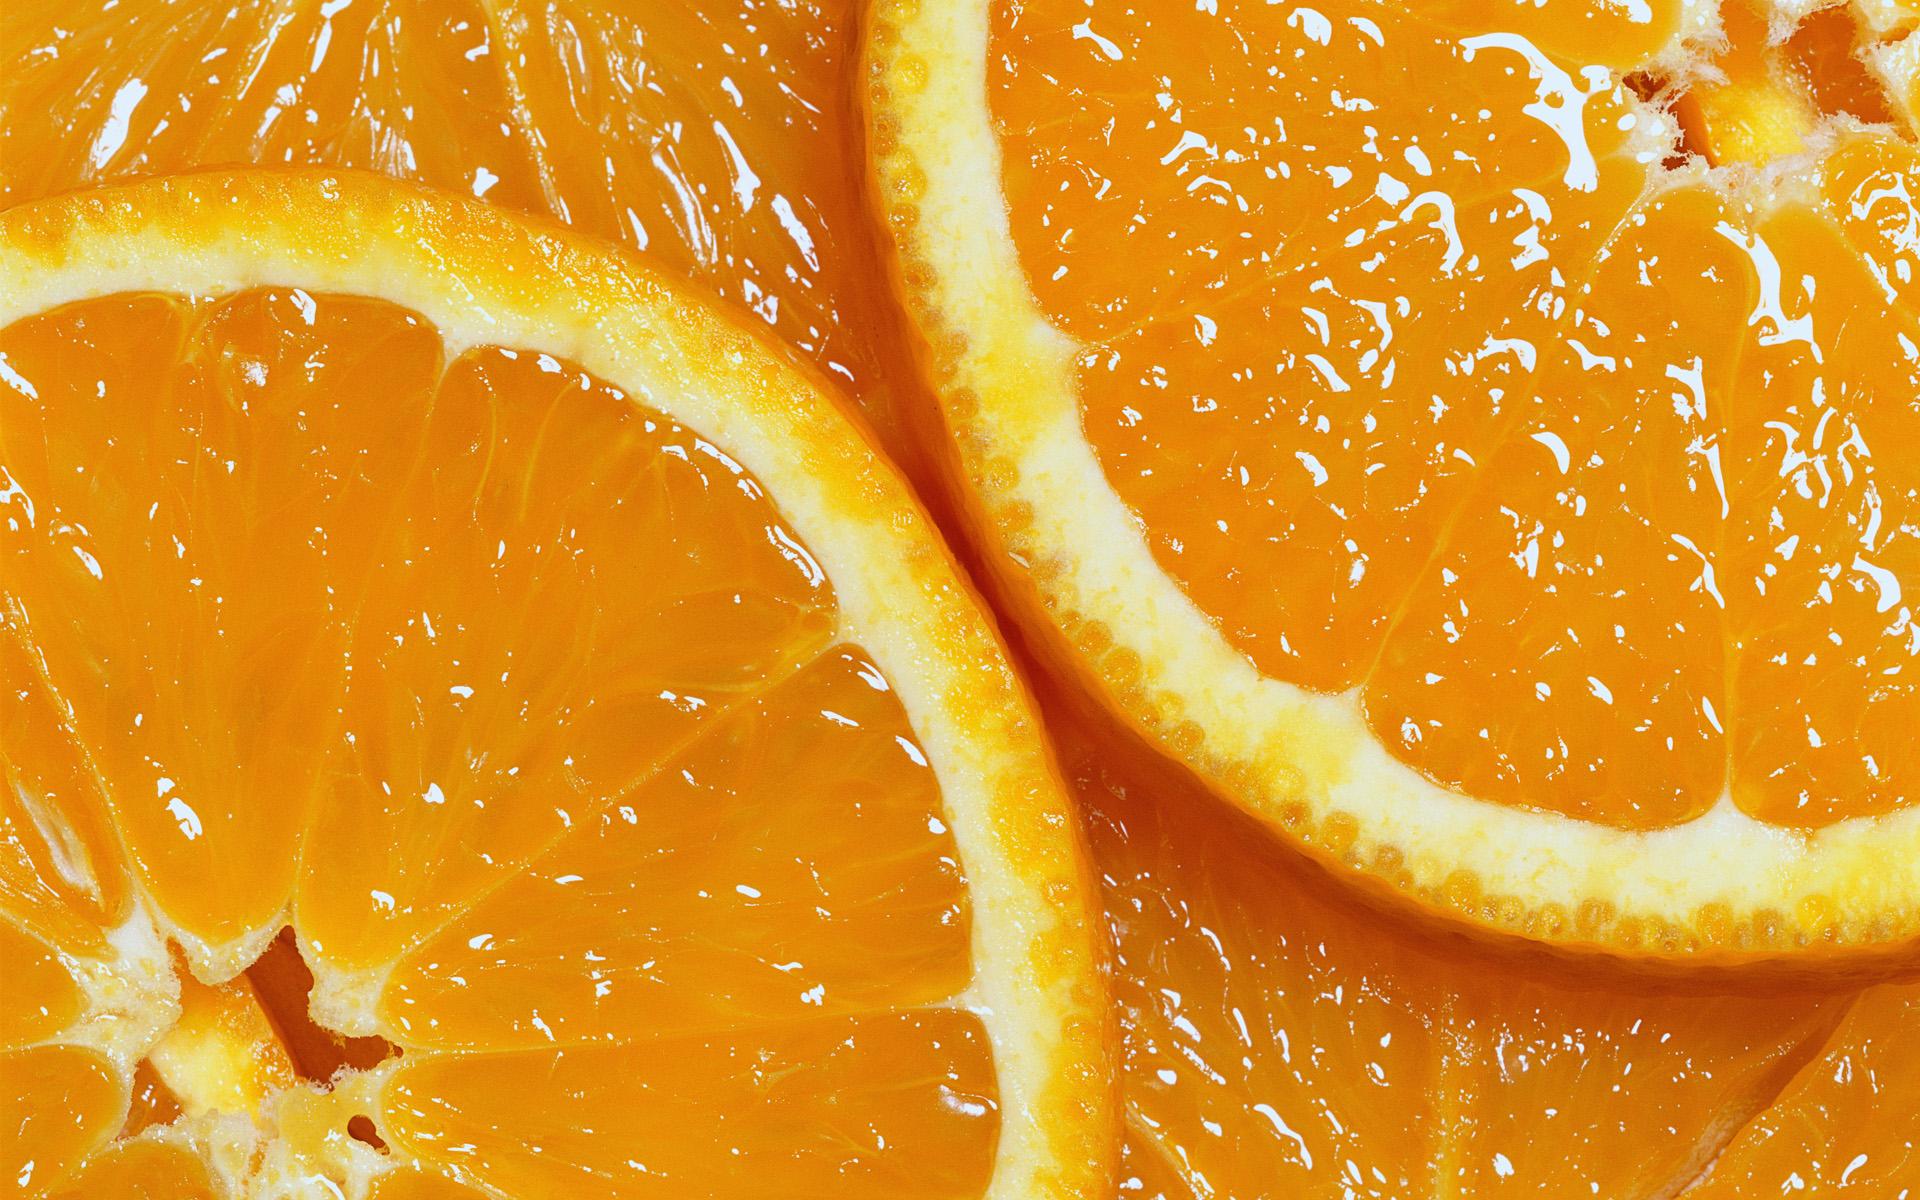 Or orange fruit hd wallpaper - Fresh Fruit Desktop Backgrounds 1920x1200 Hd Wallpapers